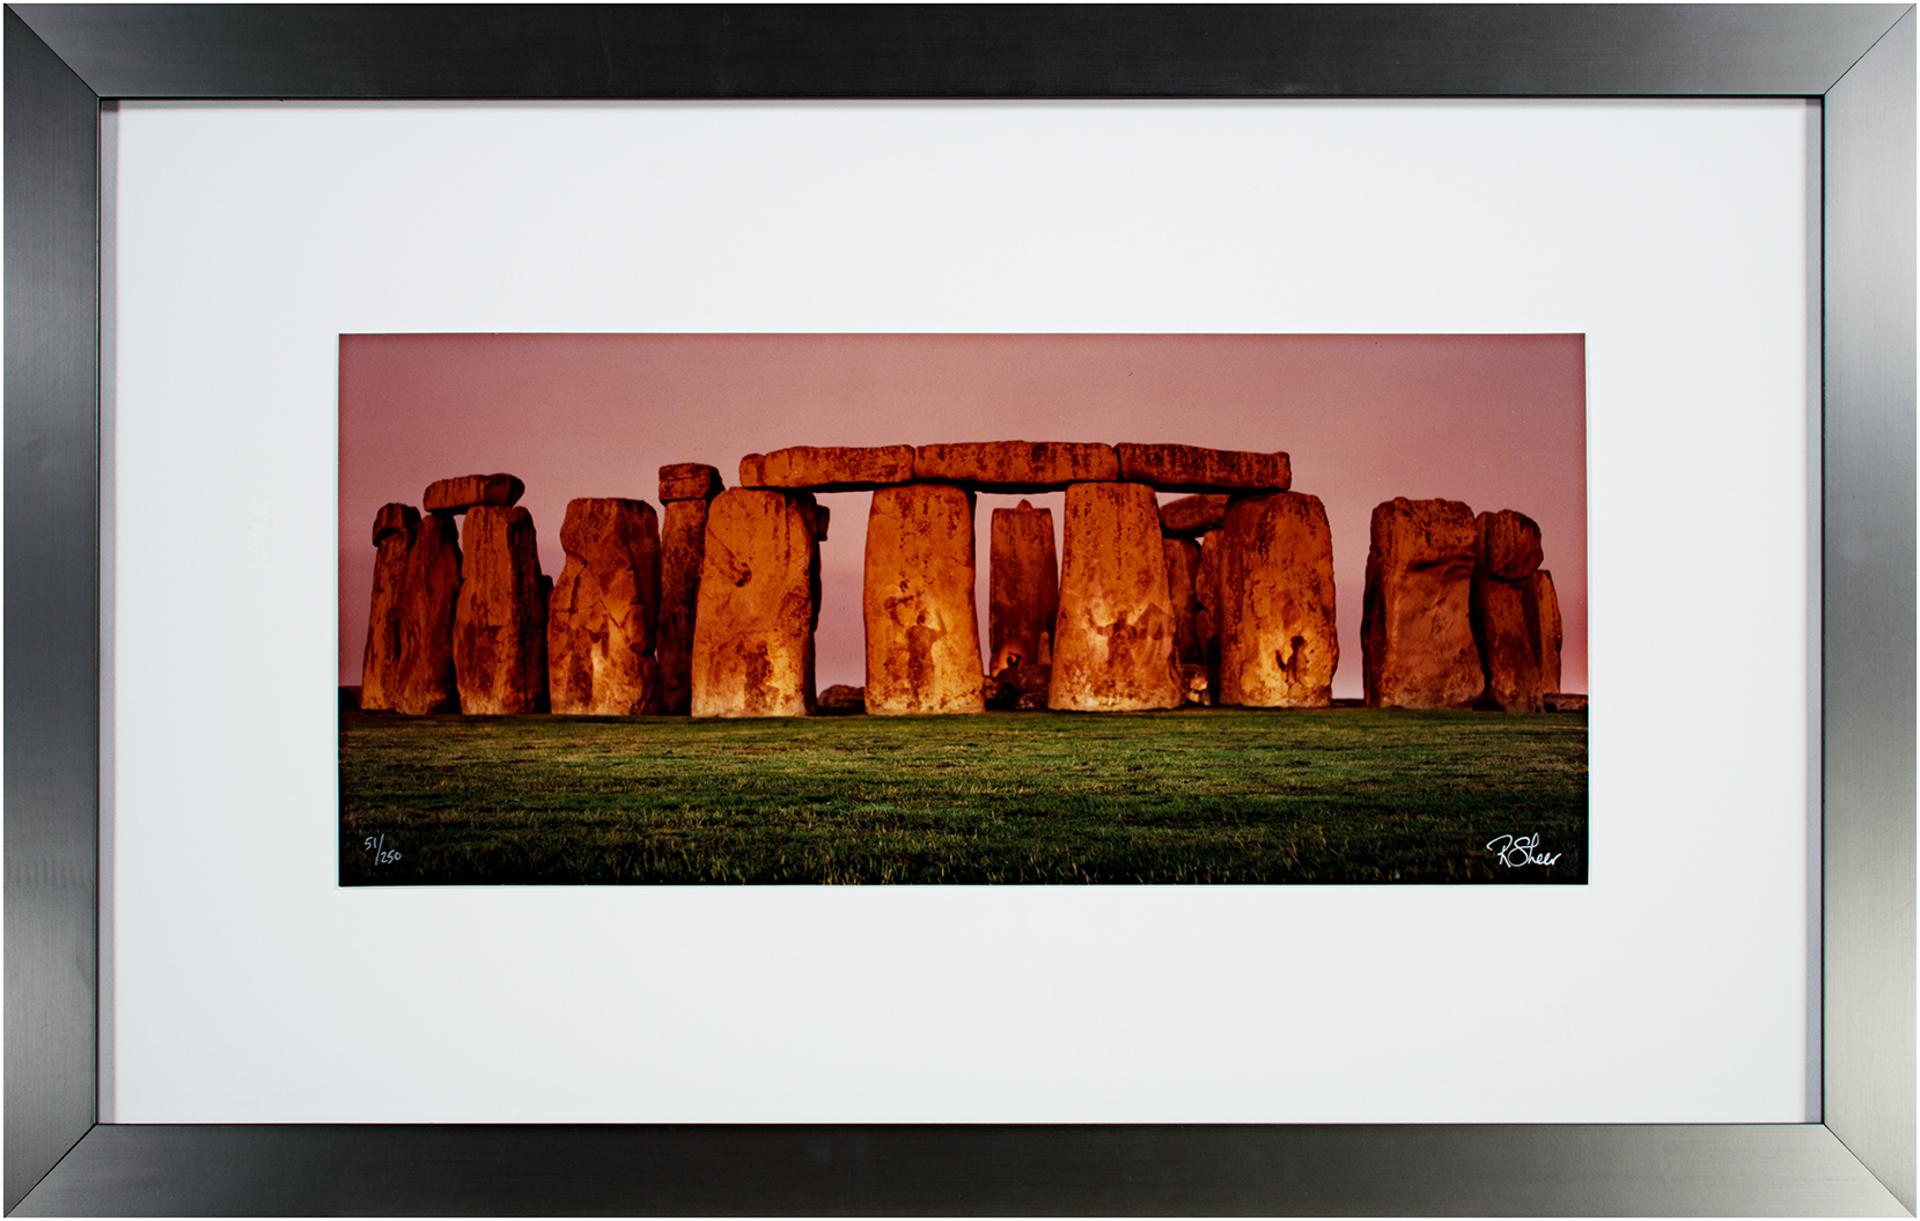 The Spirits of Stonehenge by Robert Kawika Sheer